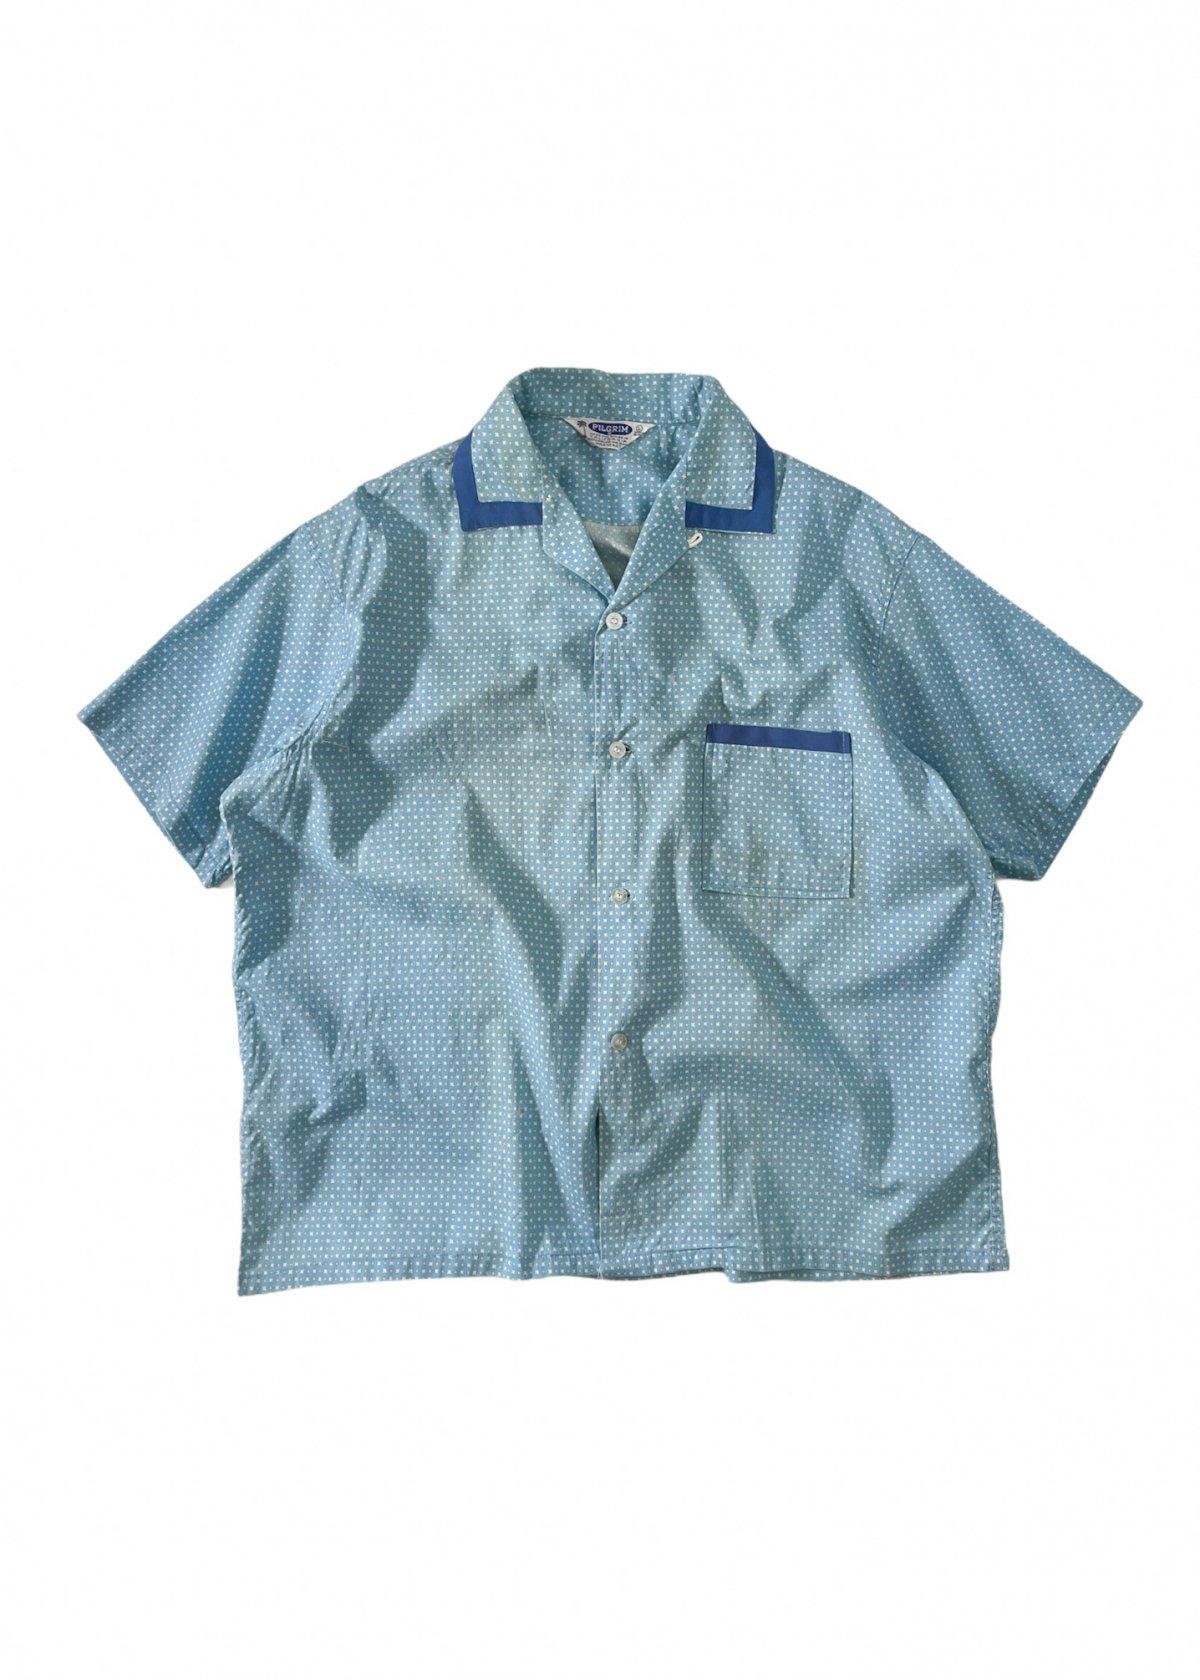 50's PILGRIM Design S/S Shirt